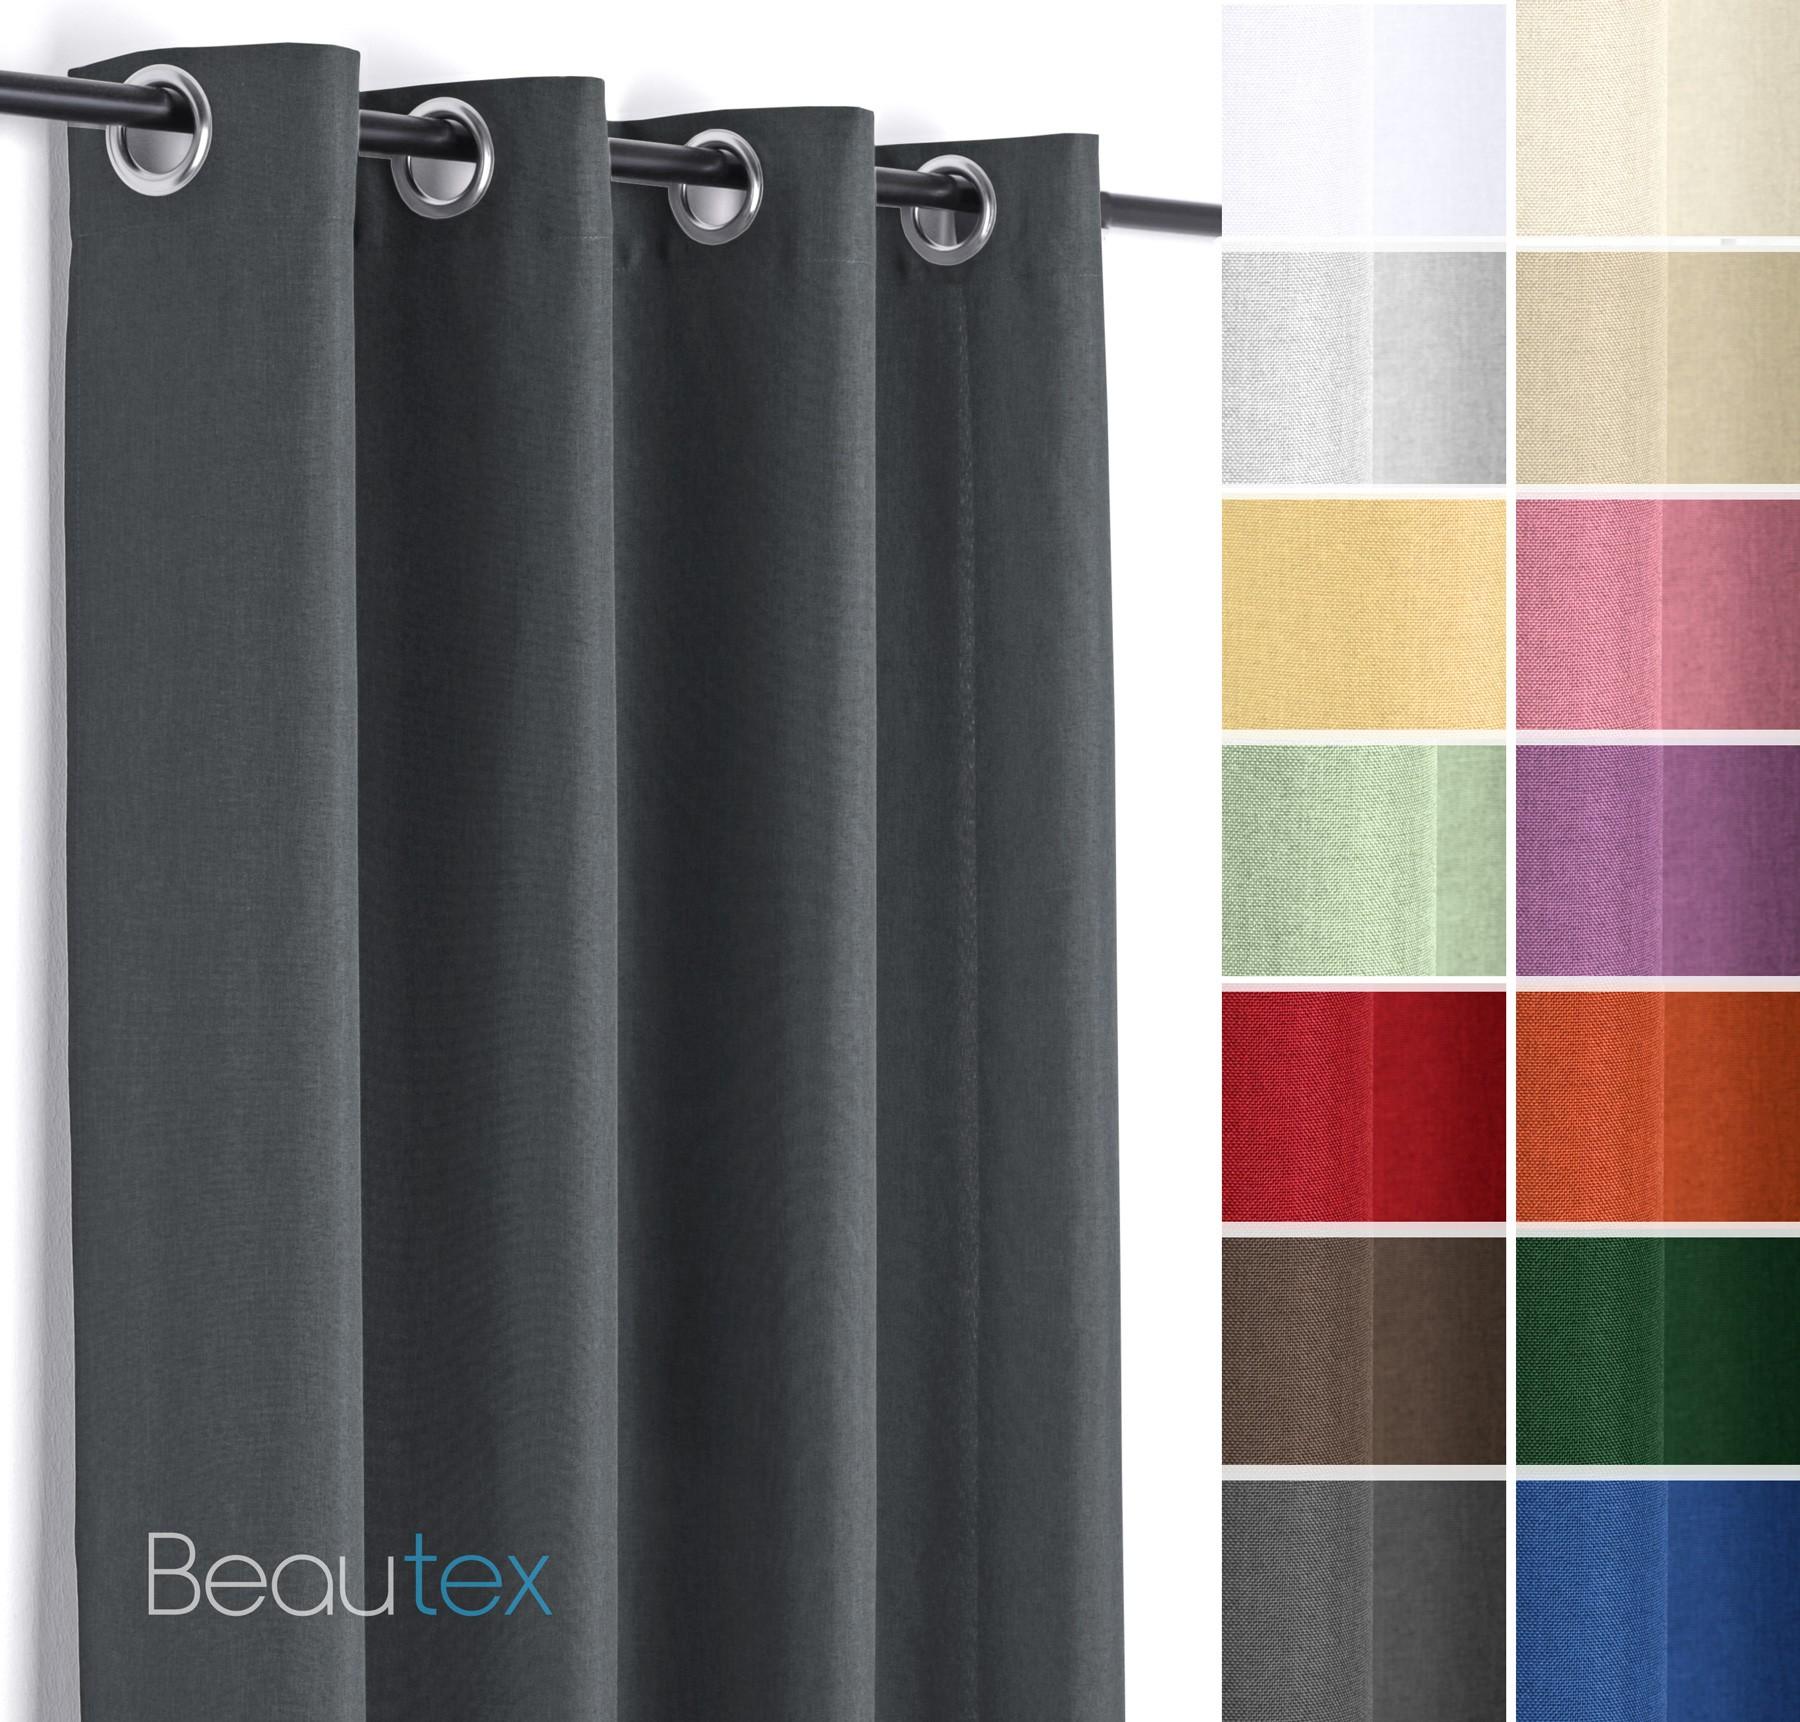 Gardinen Ösen leinen optik brilliant Ösenvorhang, gardine mit Ösen 140x245 cm